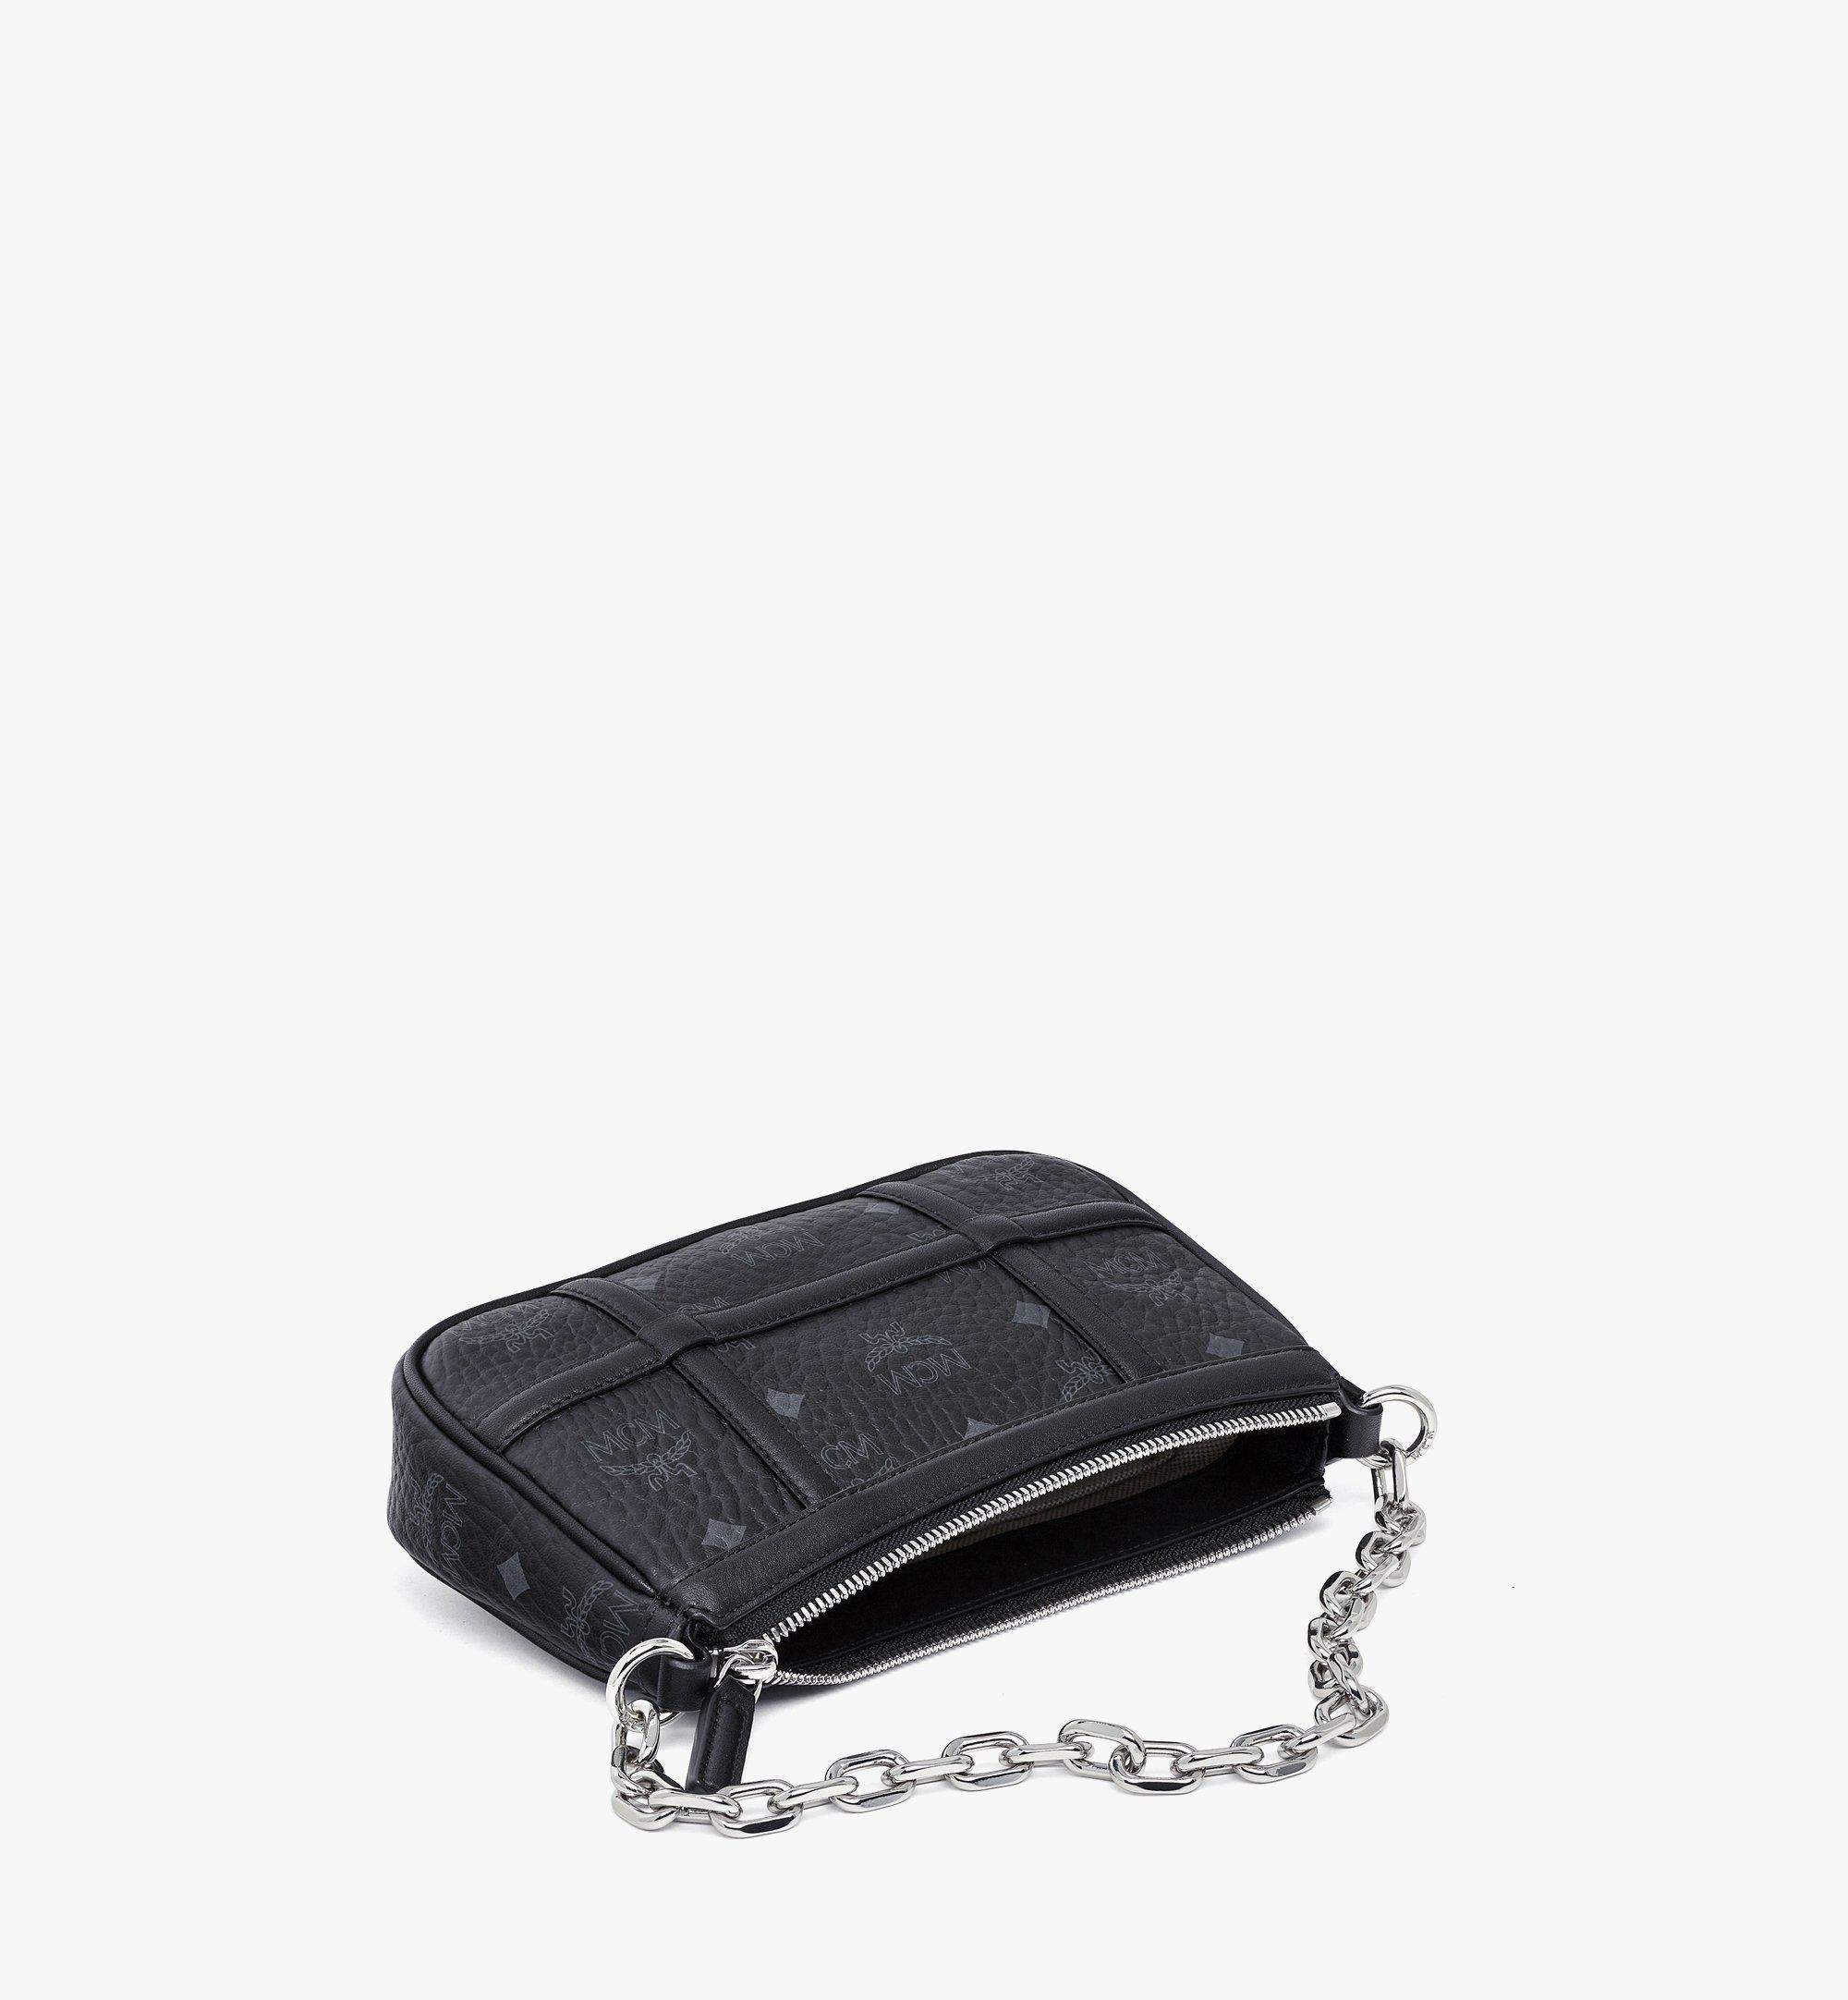 MCM Delmy Shoulder Bag in Visetos Black MWSBAER01BK001 Alternate View 2